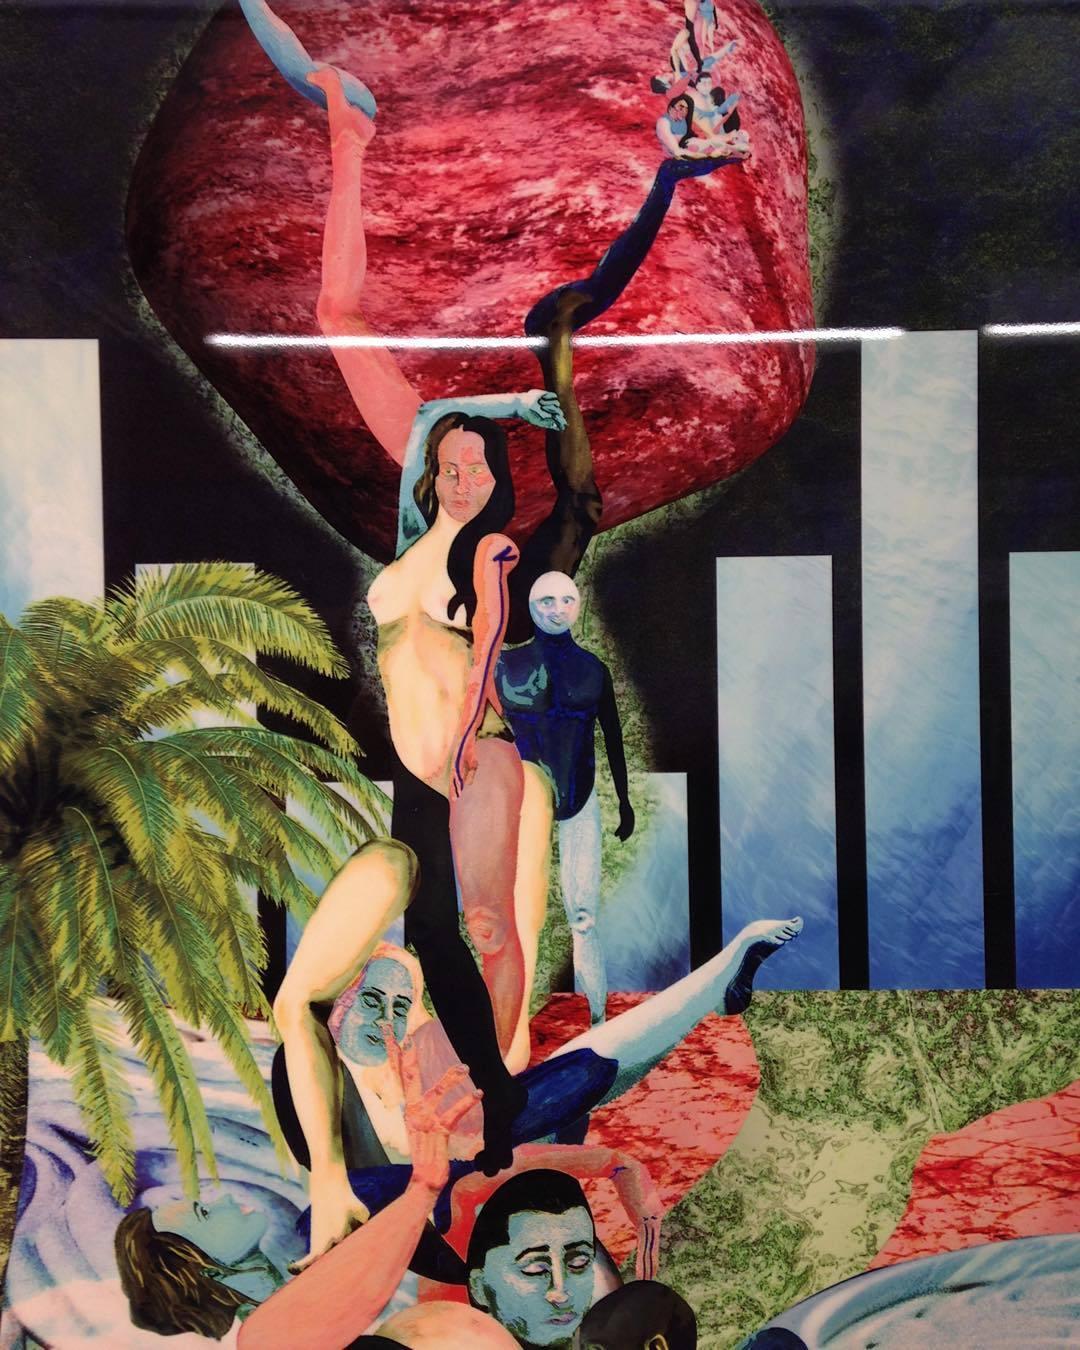 'The Reach' by Andy Pestontnik #artbeacondsm by artbeacondsm  http://ift.tt/1Th5LGX